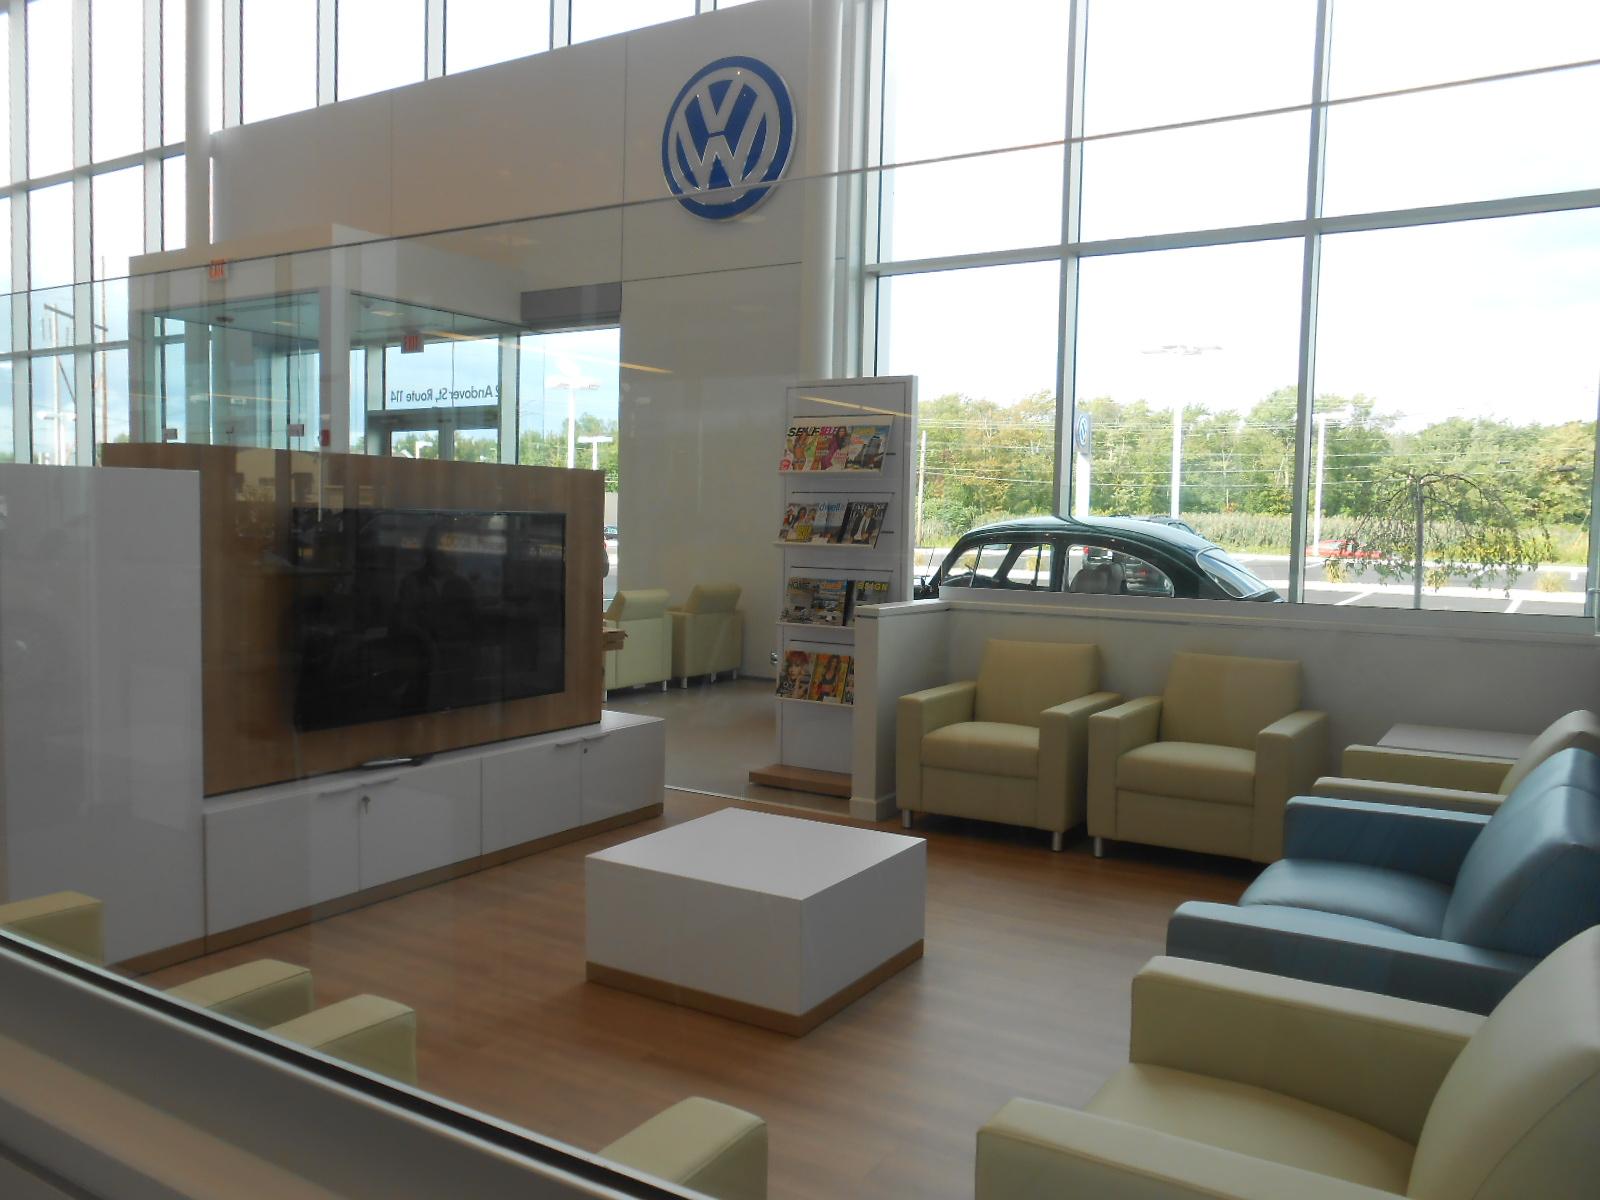 Kelly Volkswagen Coupons Near Me In Danvers 8coupons